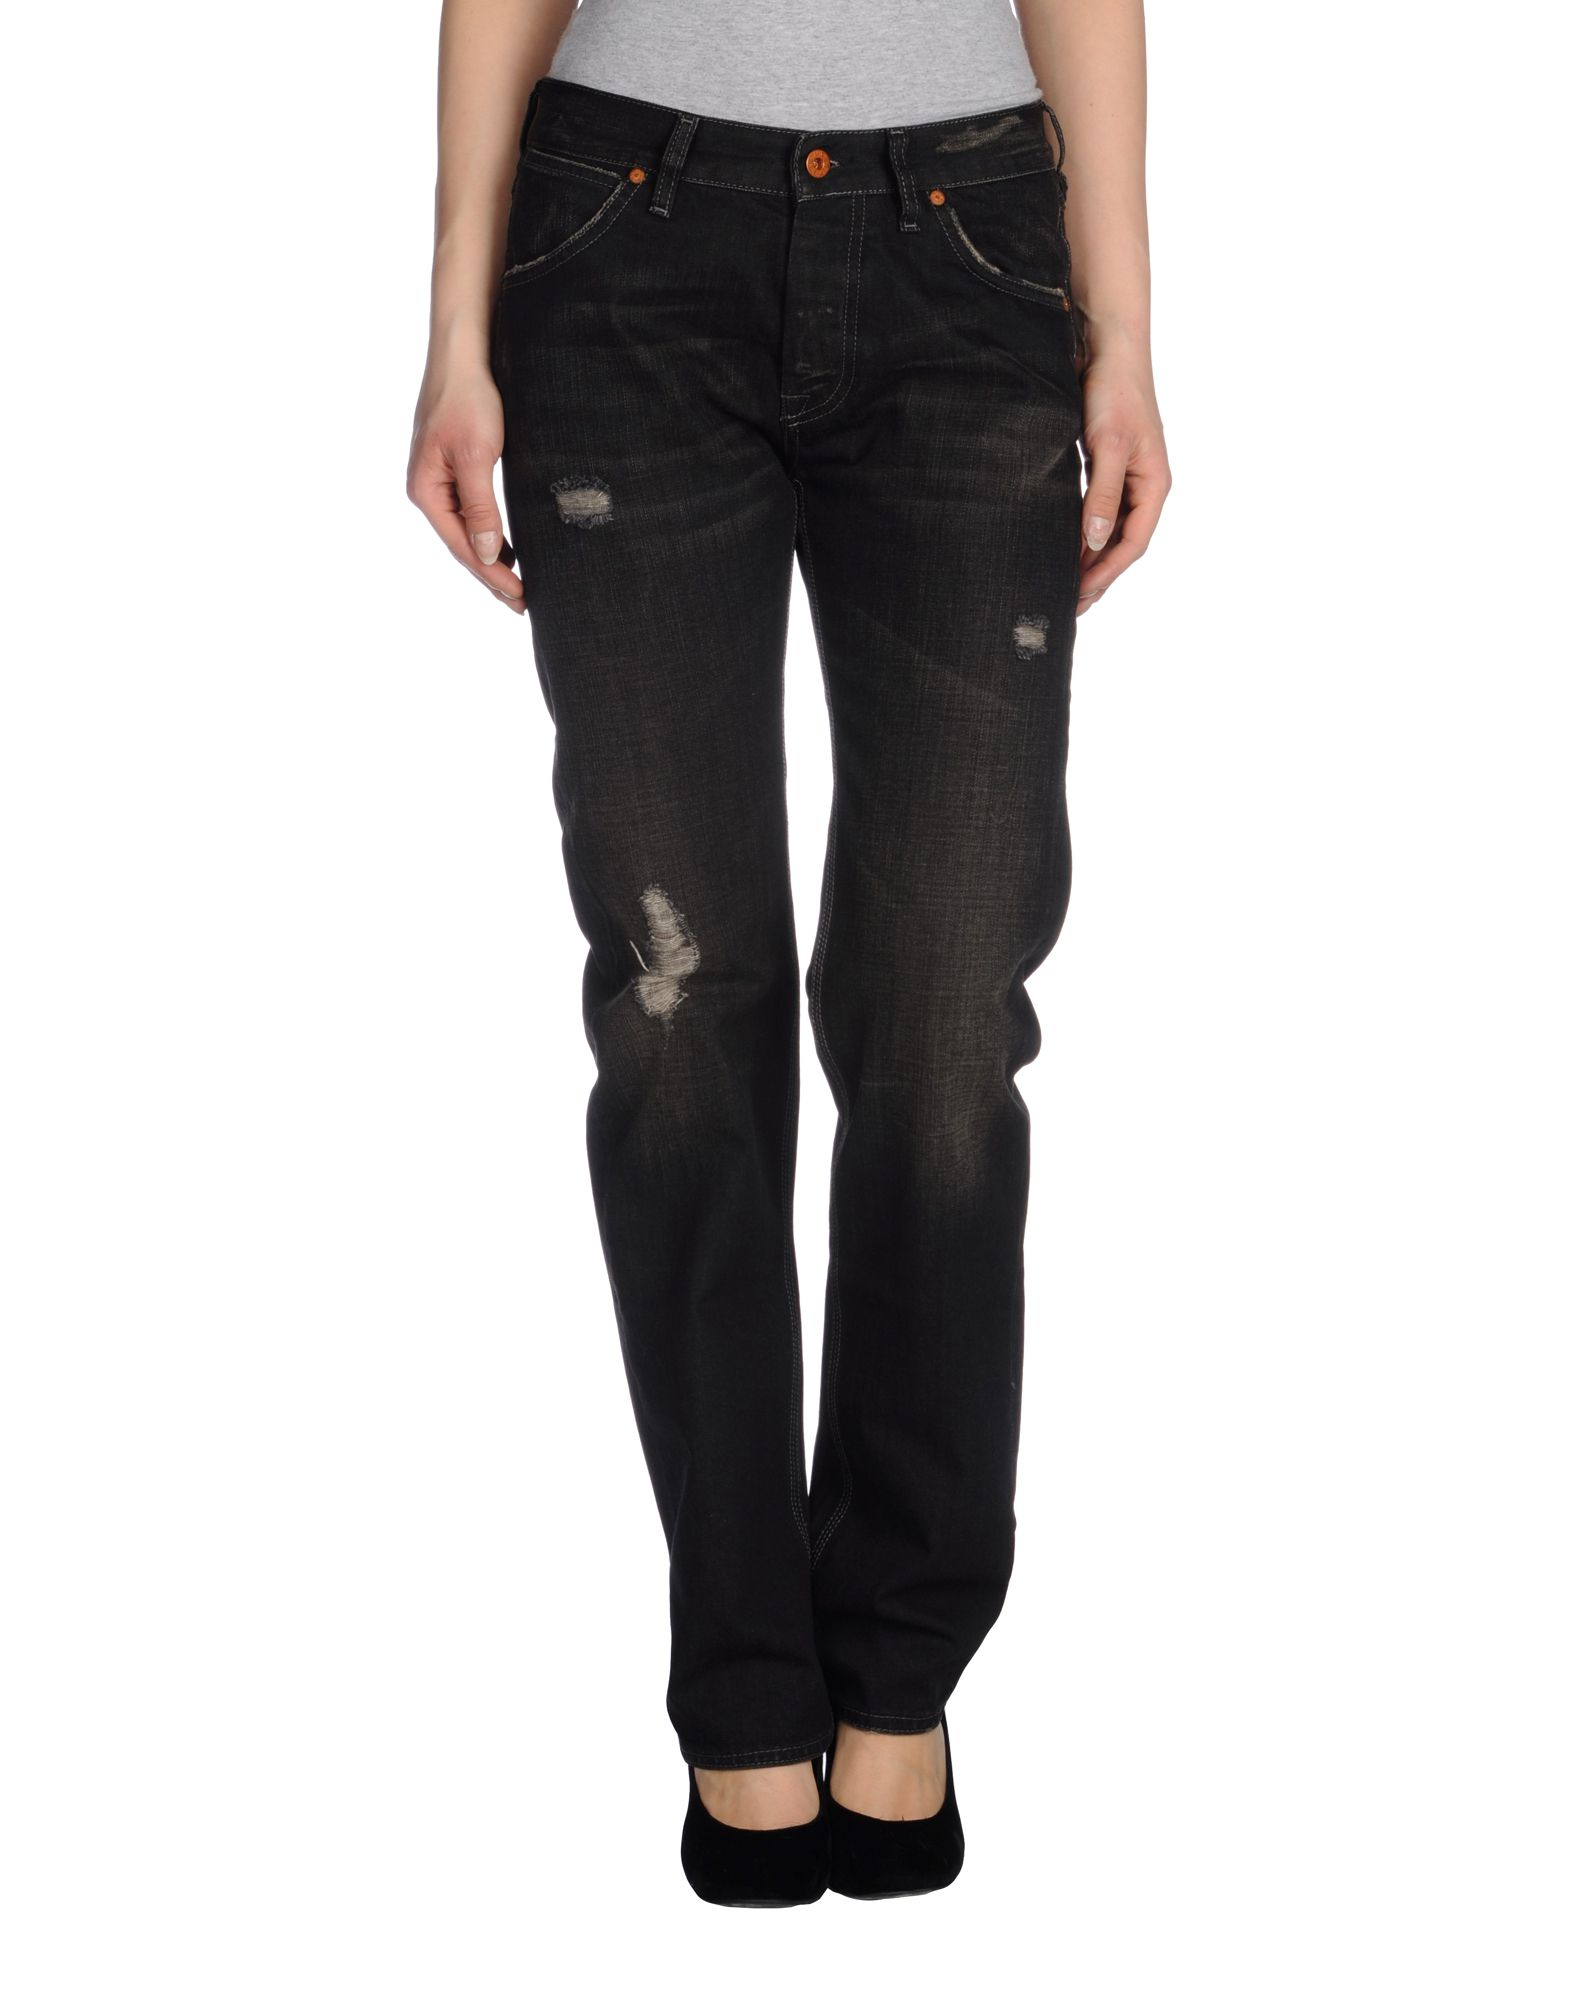 GRIFONI SUPER VINTAGE Jeans